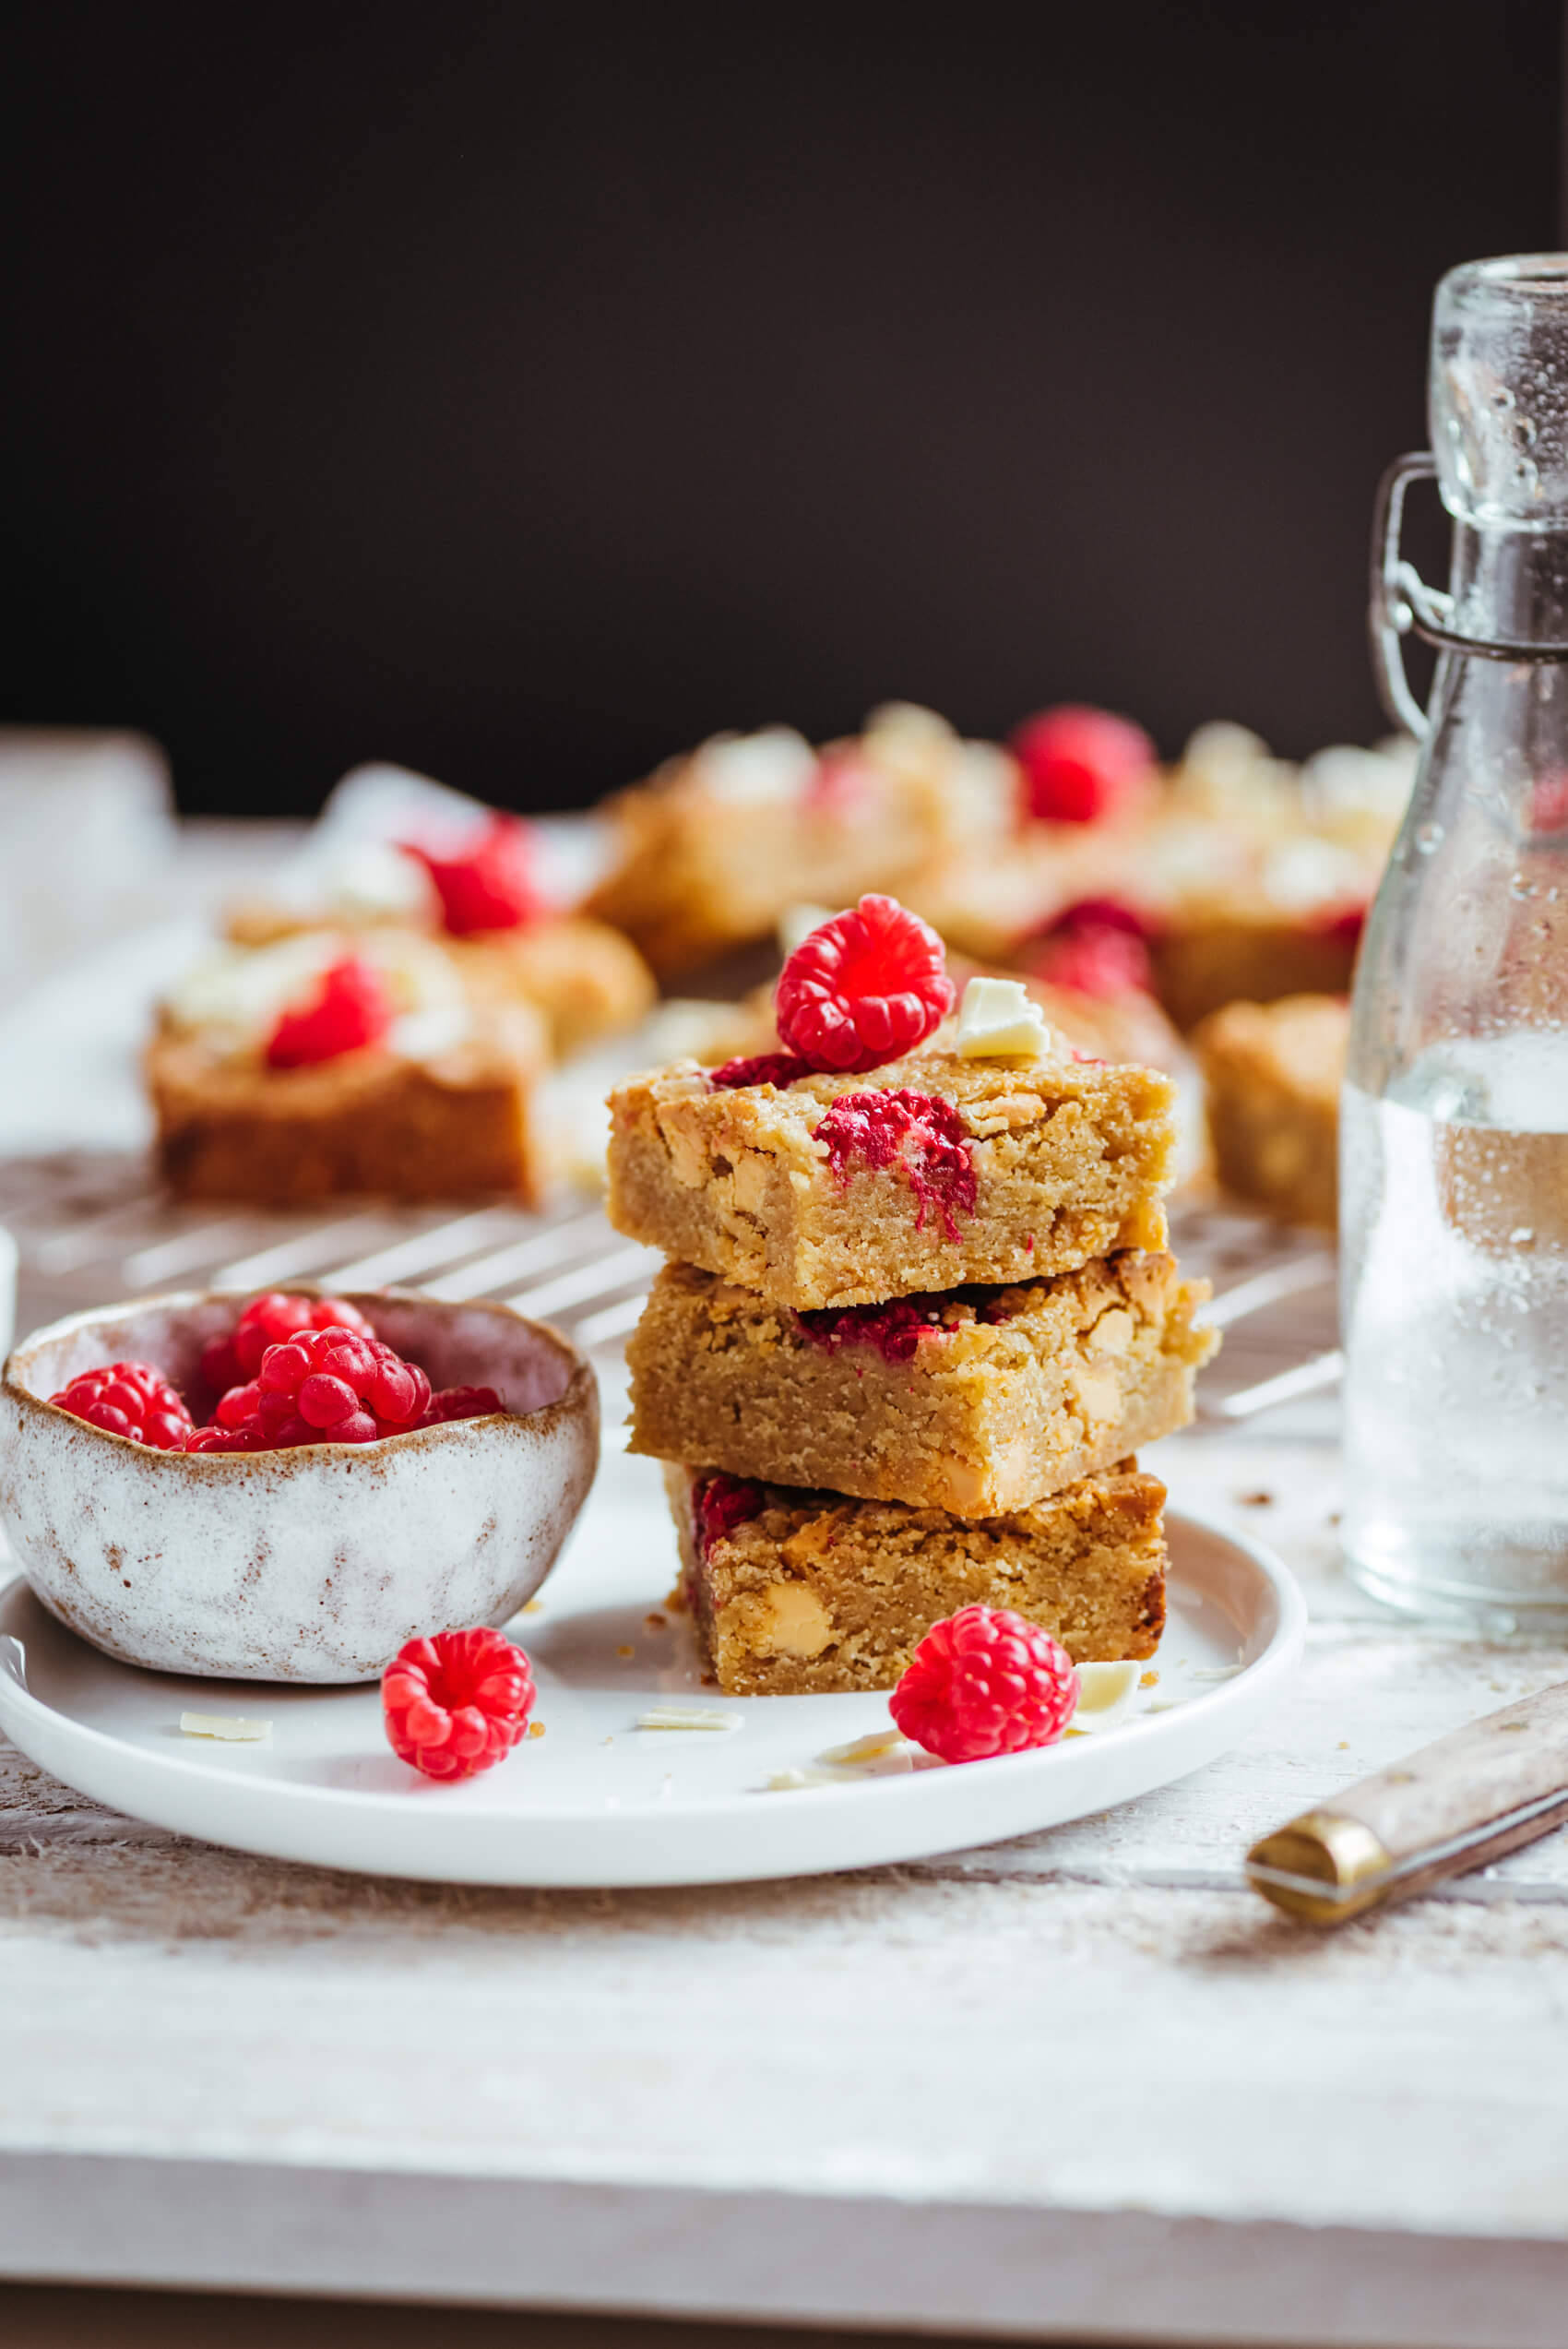 Blondie framboises chocolat blanc - Lilie Bakery